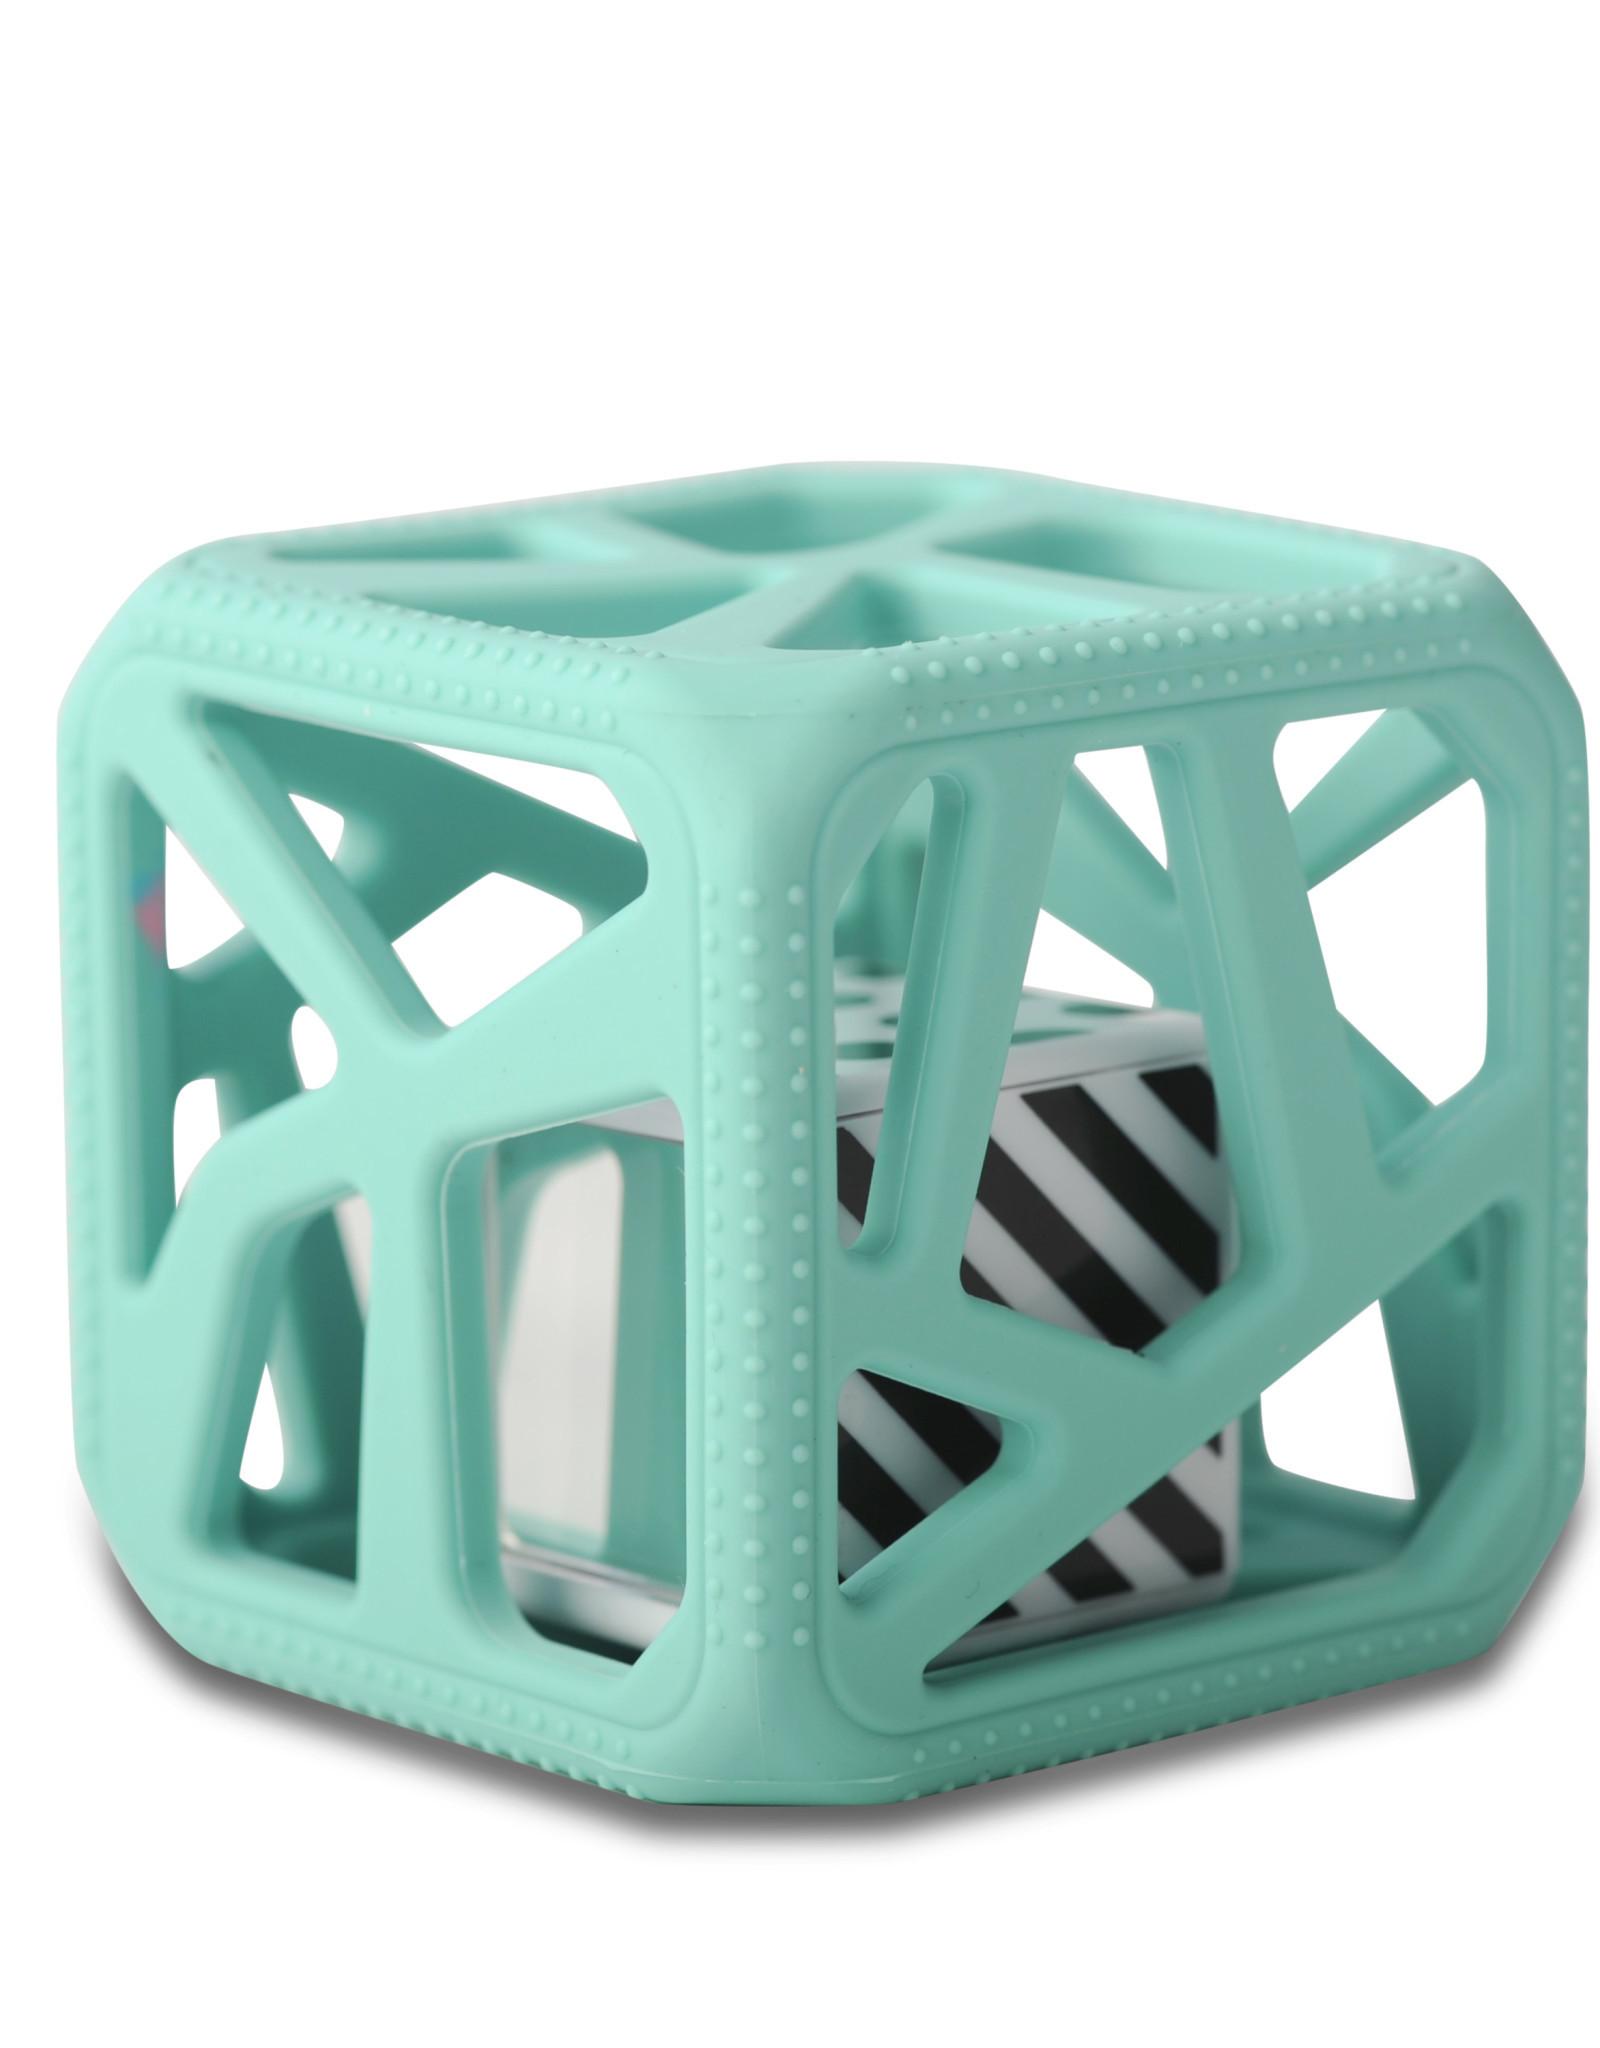 Malarkey Kids Malarkey Kids Chew Cube - Mint